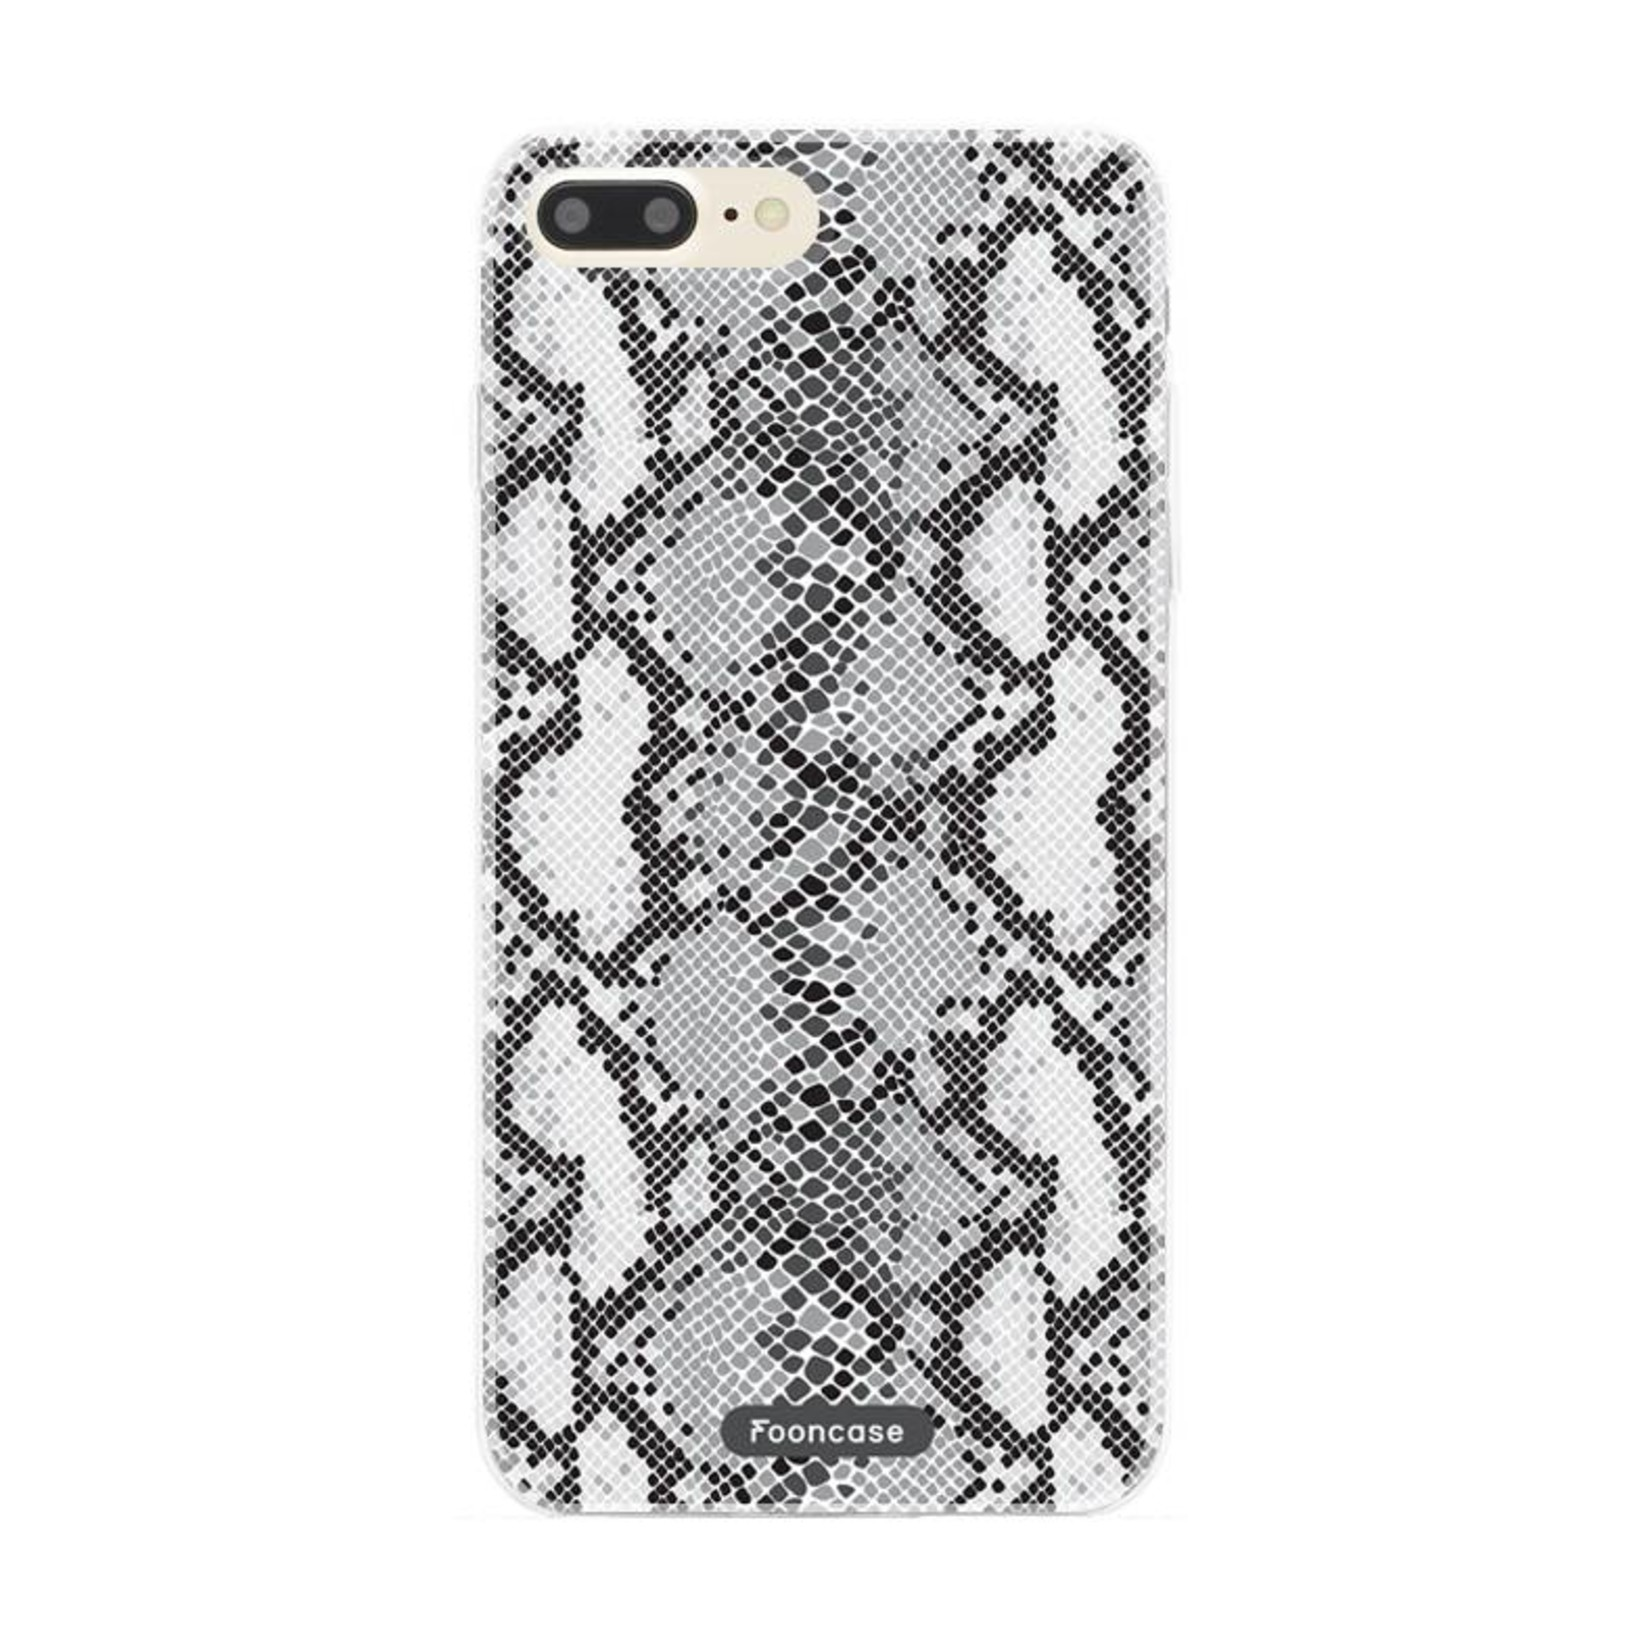 FOONCASE iPhone 8 Plus hoesje TPU Soft Case - Back Cover - Snake it / Slangen print